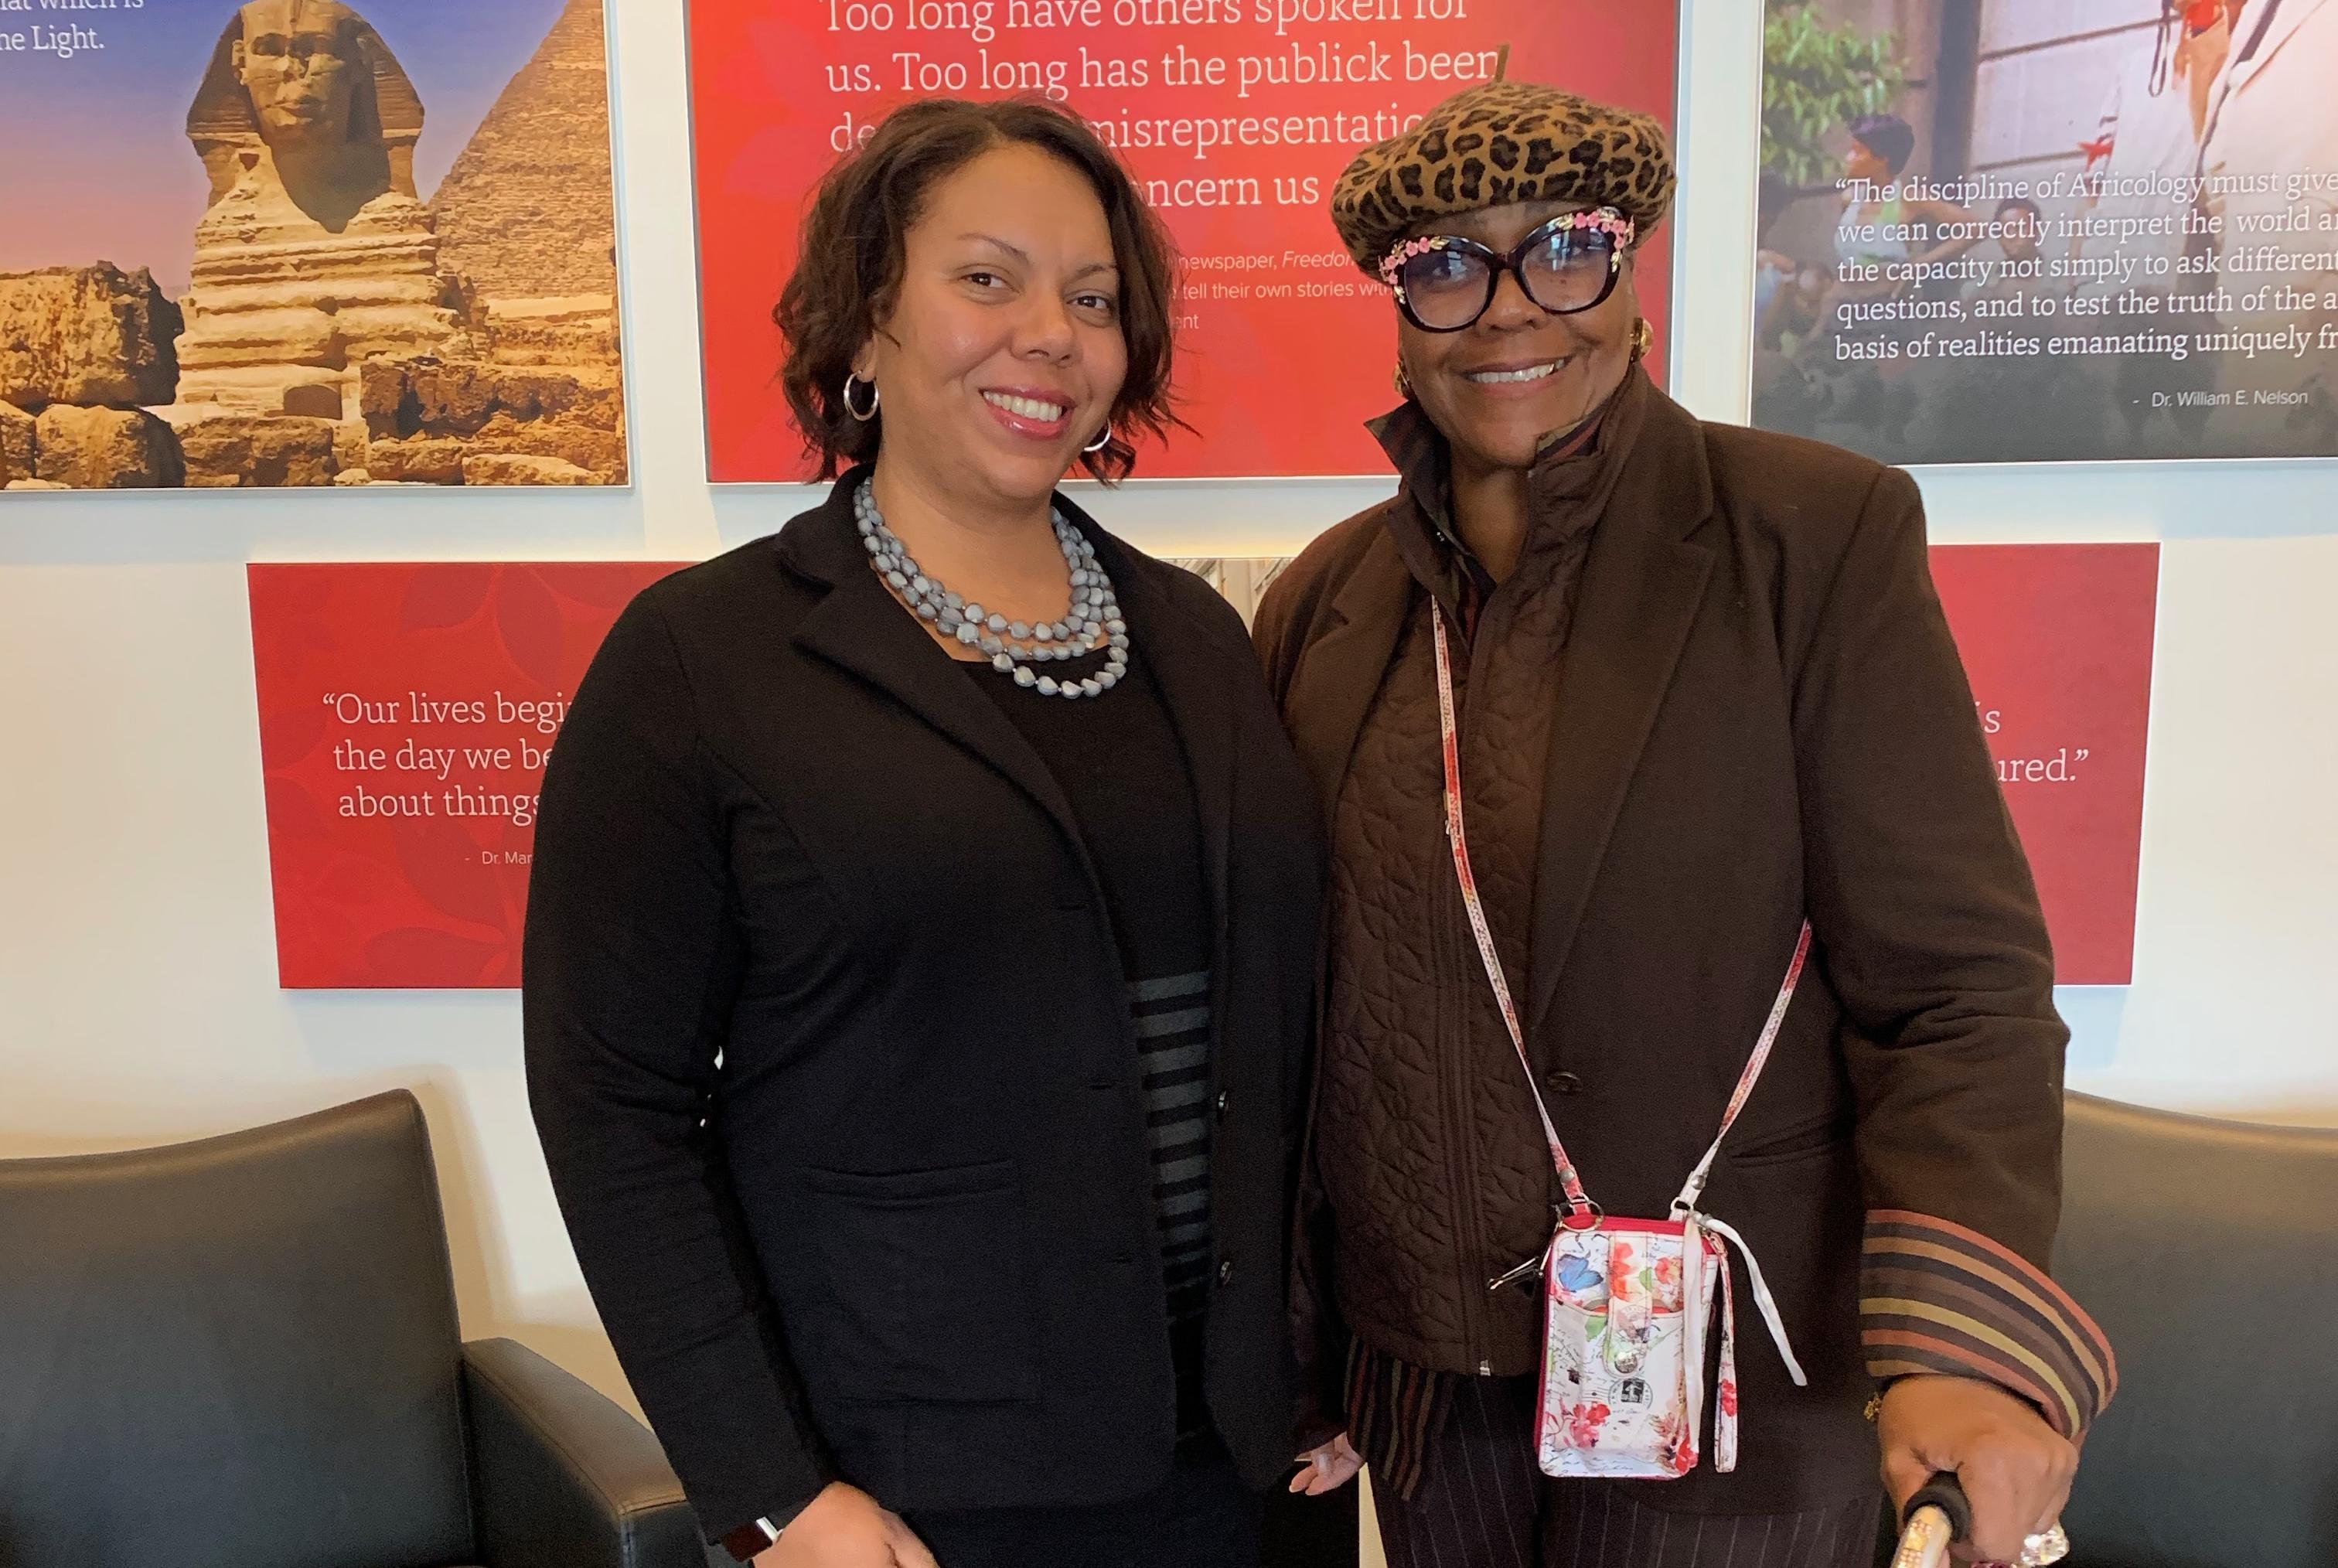 Dr. Simone Drake (left) with a colleague